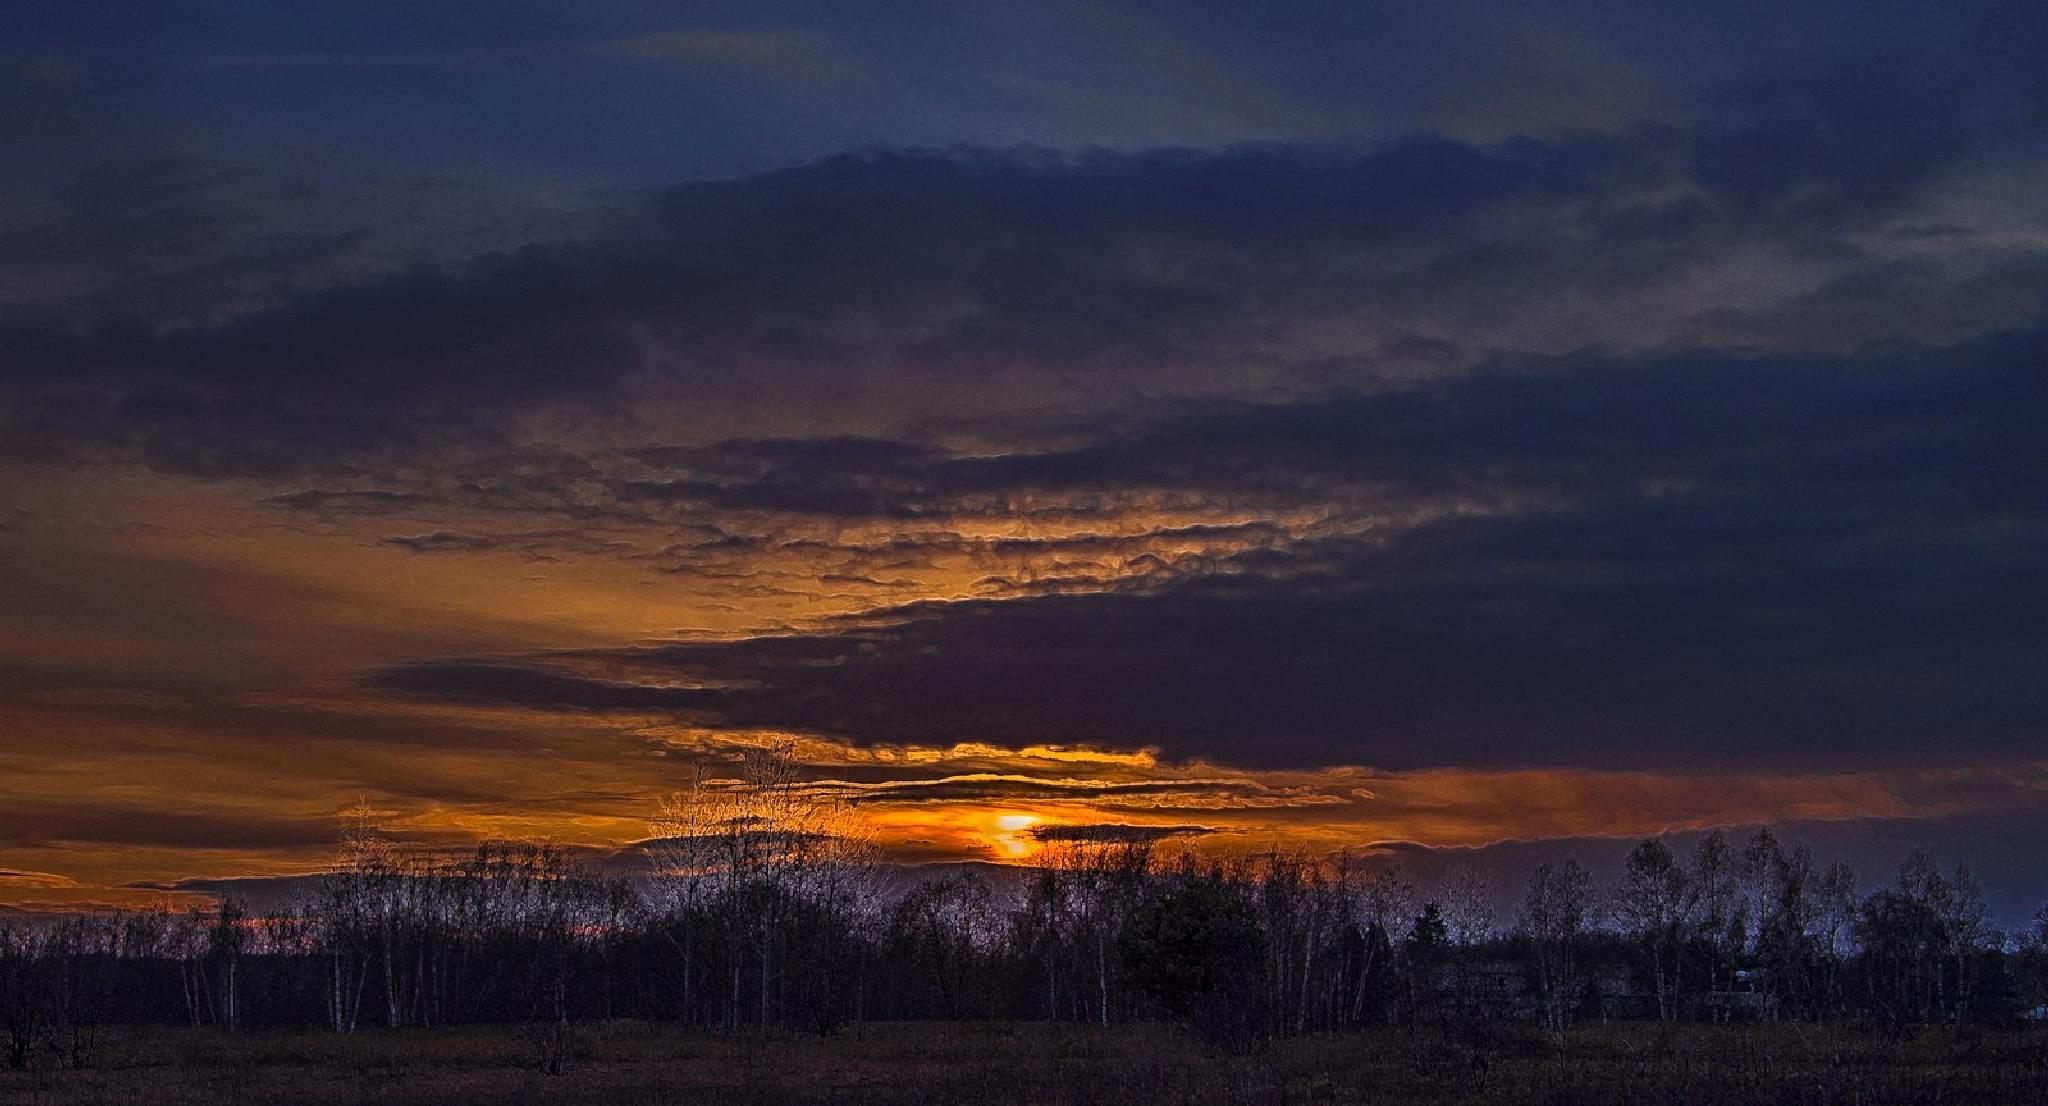 Another sunset  by Waldemar Sadlowski